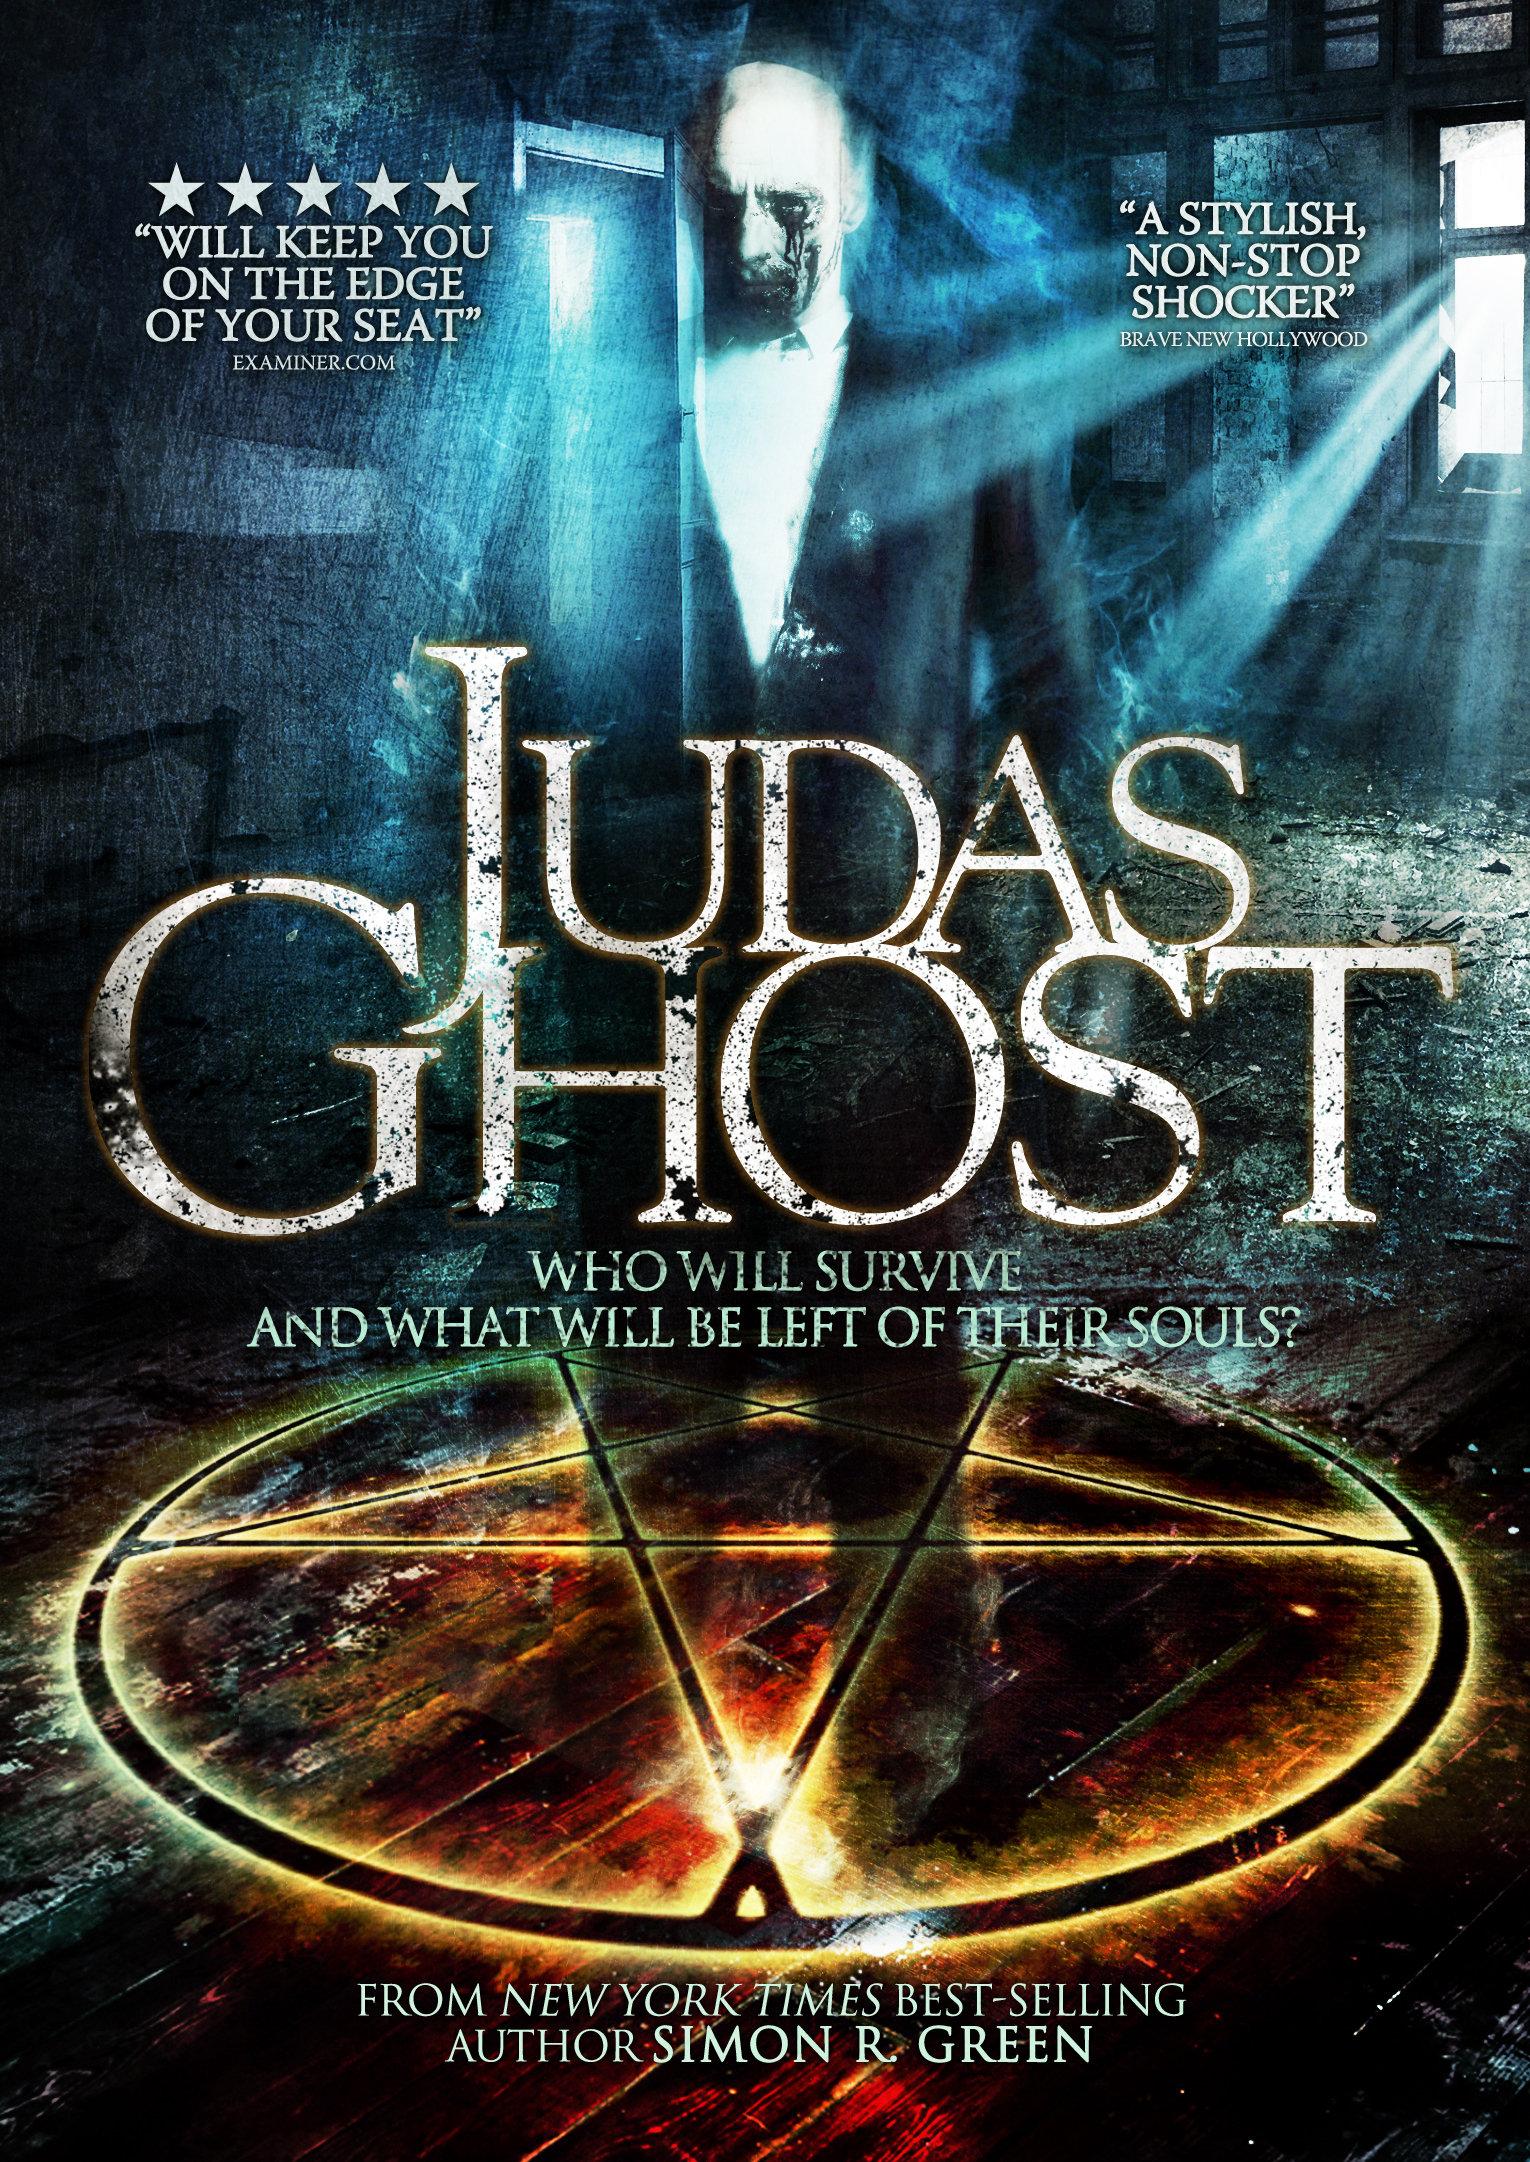 Judas Ghost (2013) - IMDb